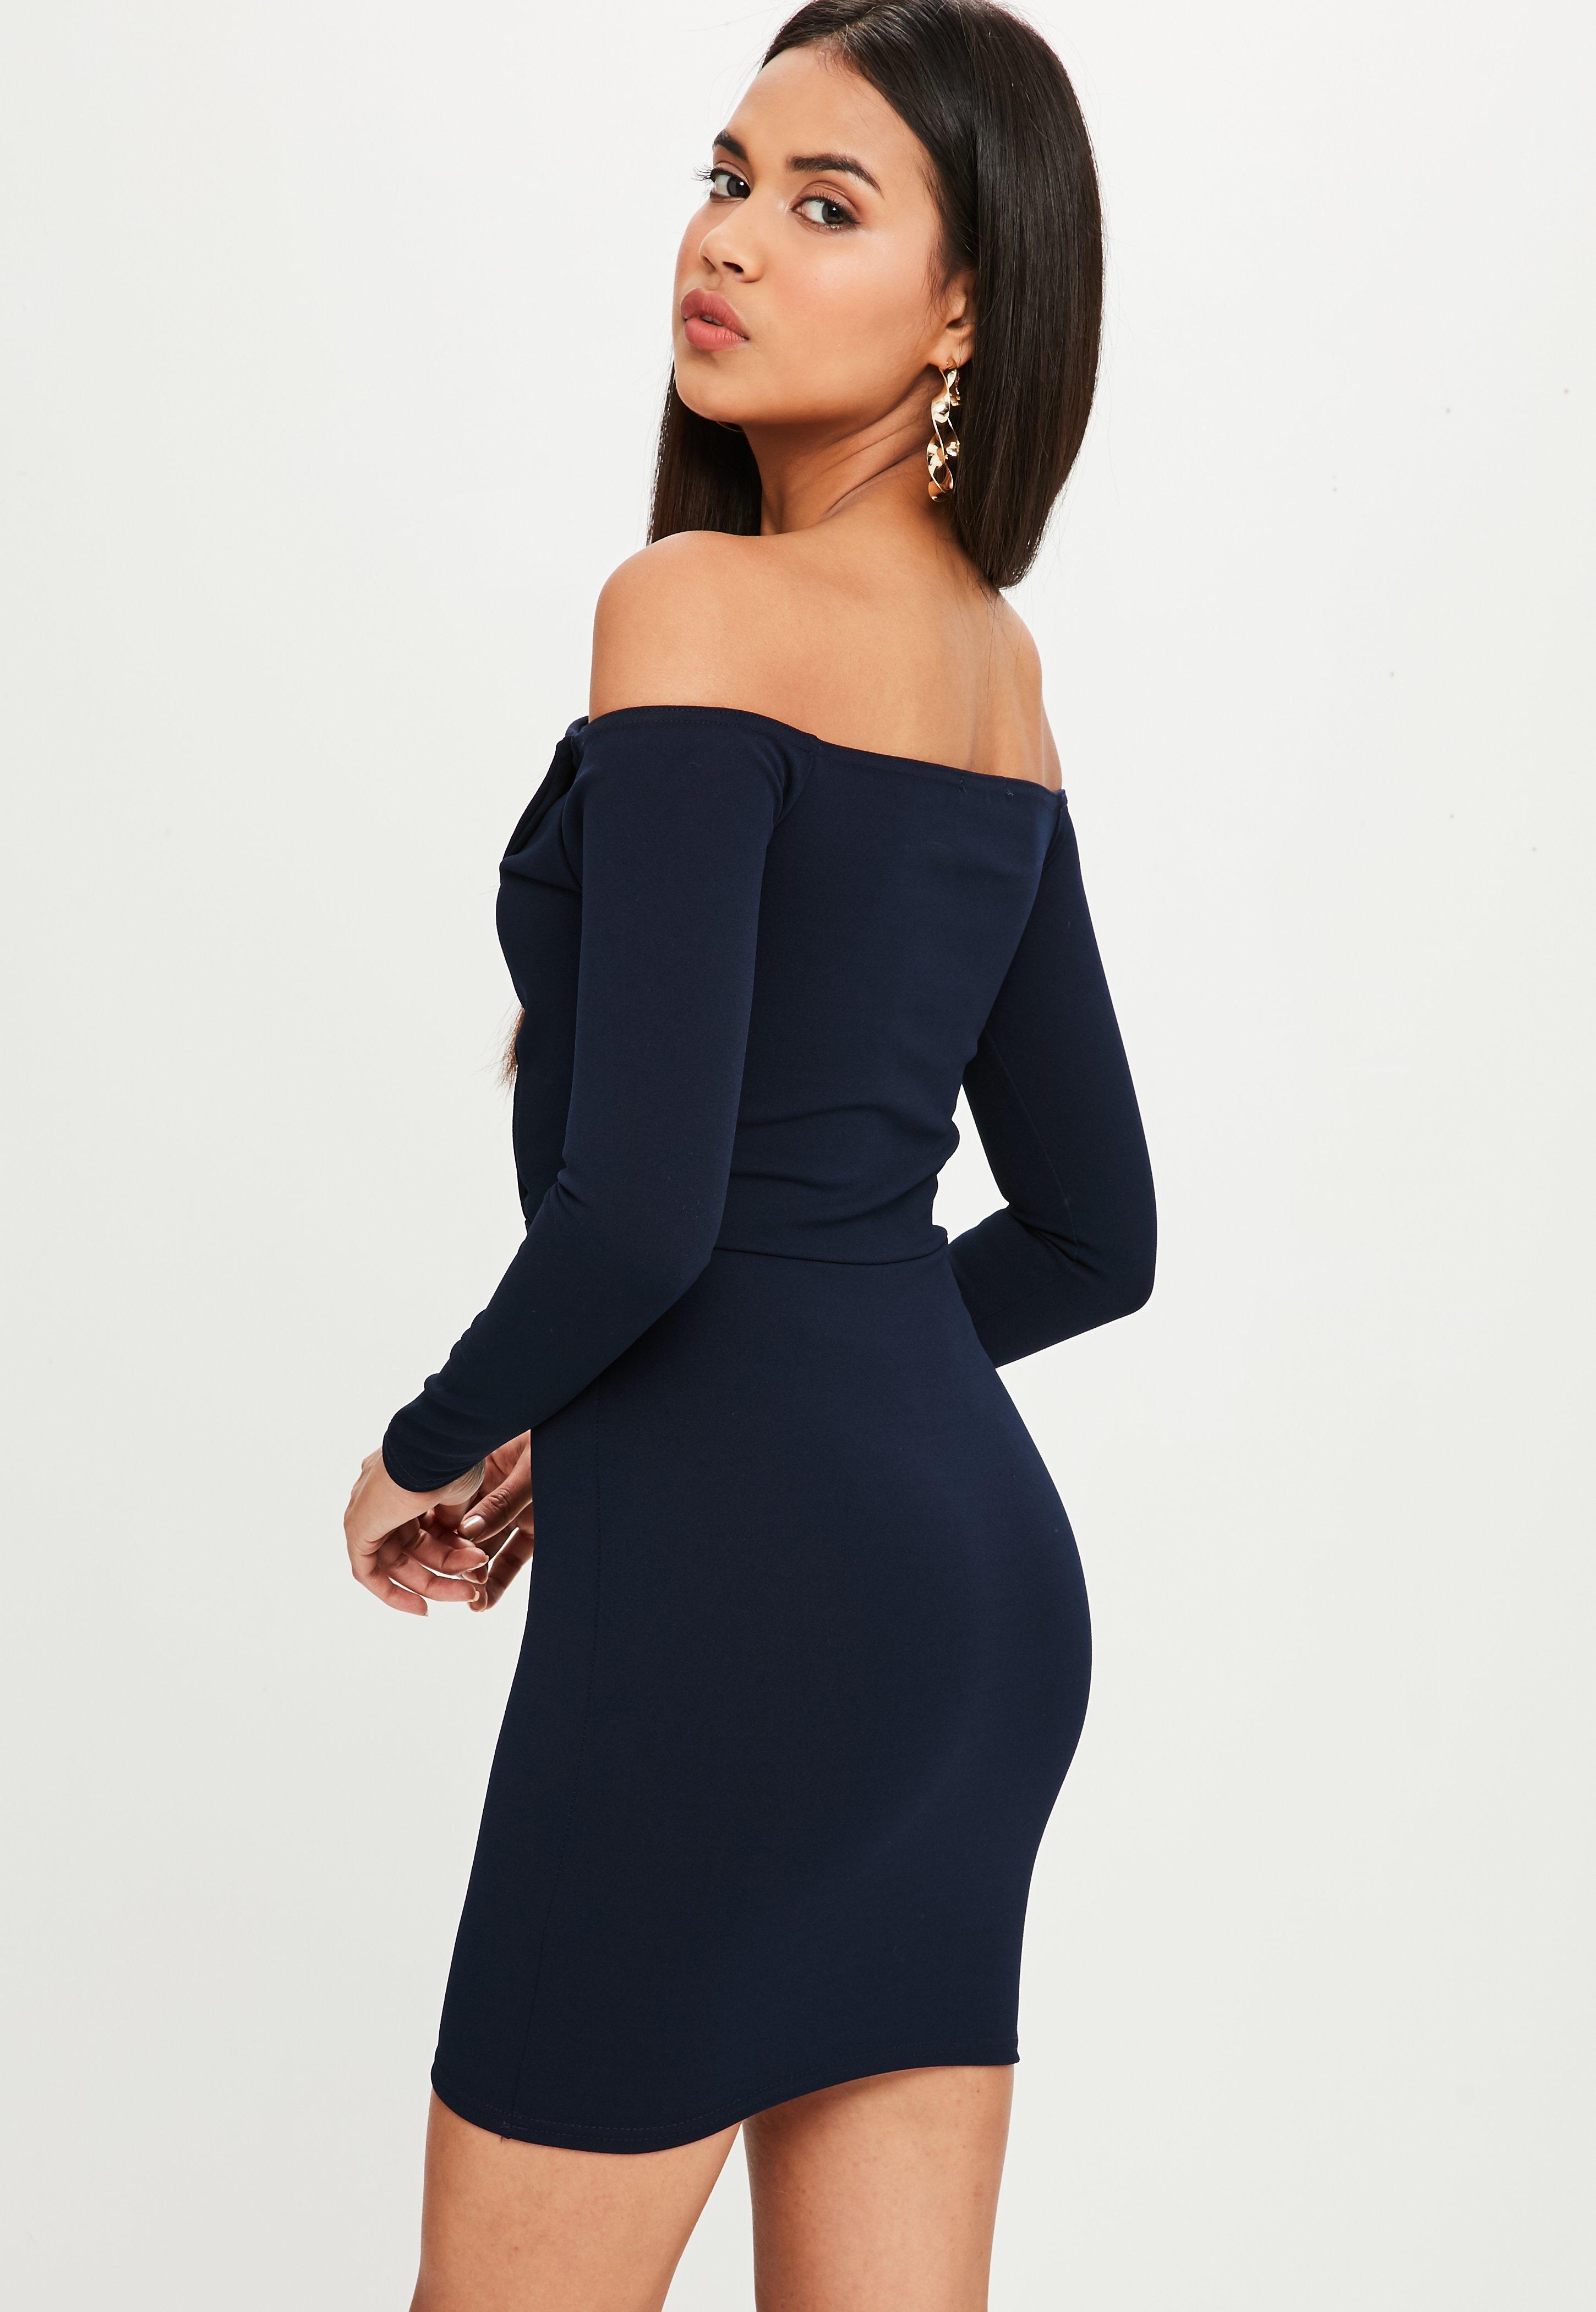 cc5e99748f Missguided - Blue Navy Bardot Foldover Wrap Dress - Lyst. View fullscreen